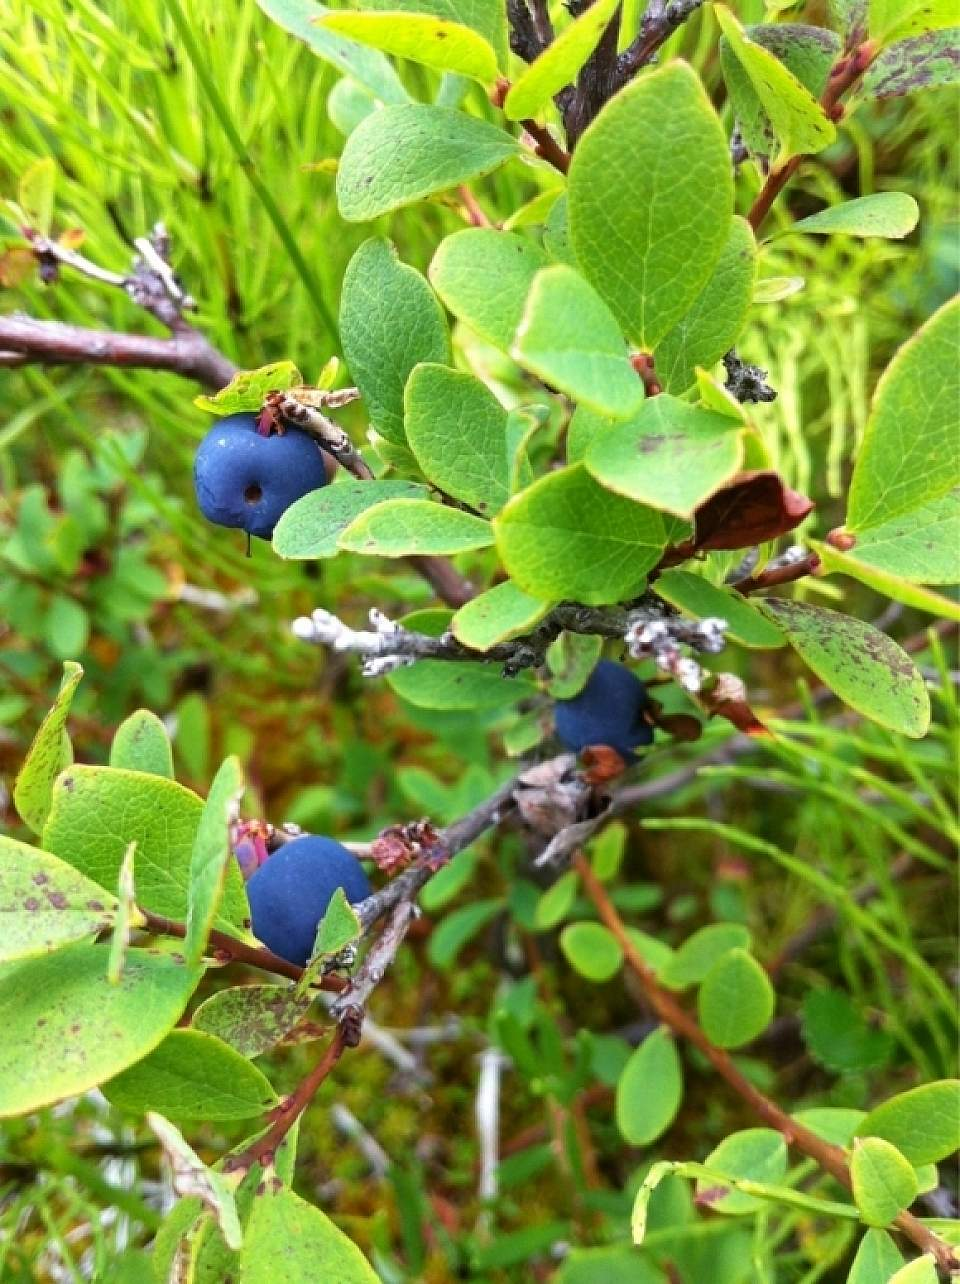 Alaska Blueberry15490ca7 71a4 45a4 9e9c 7a0d971308b0